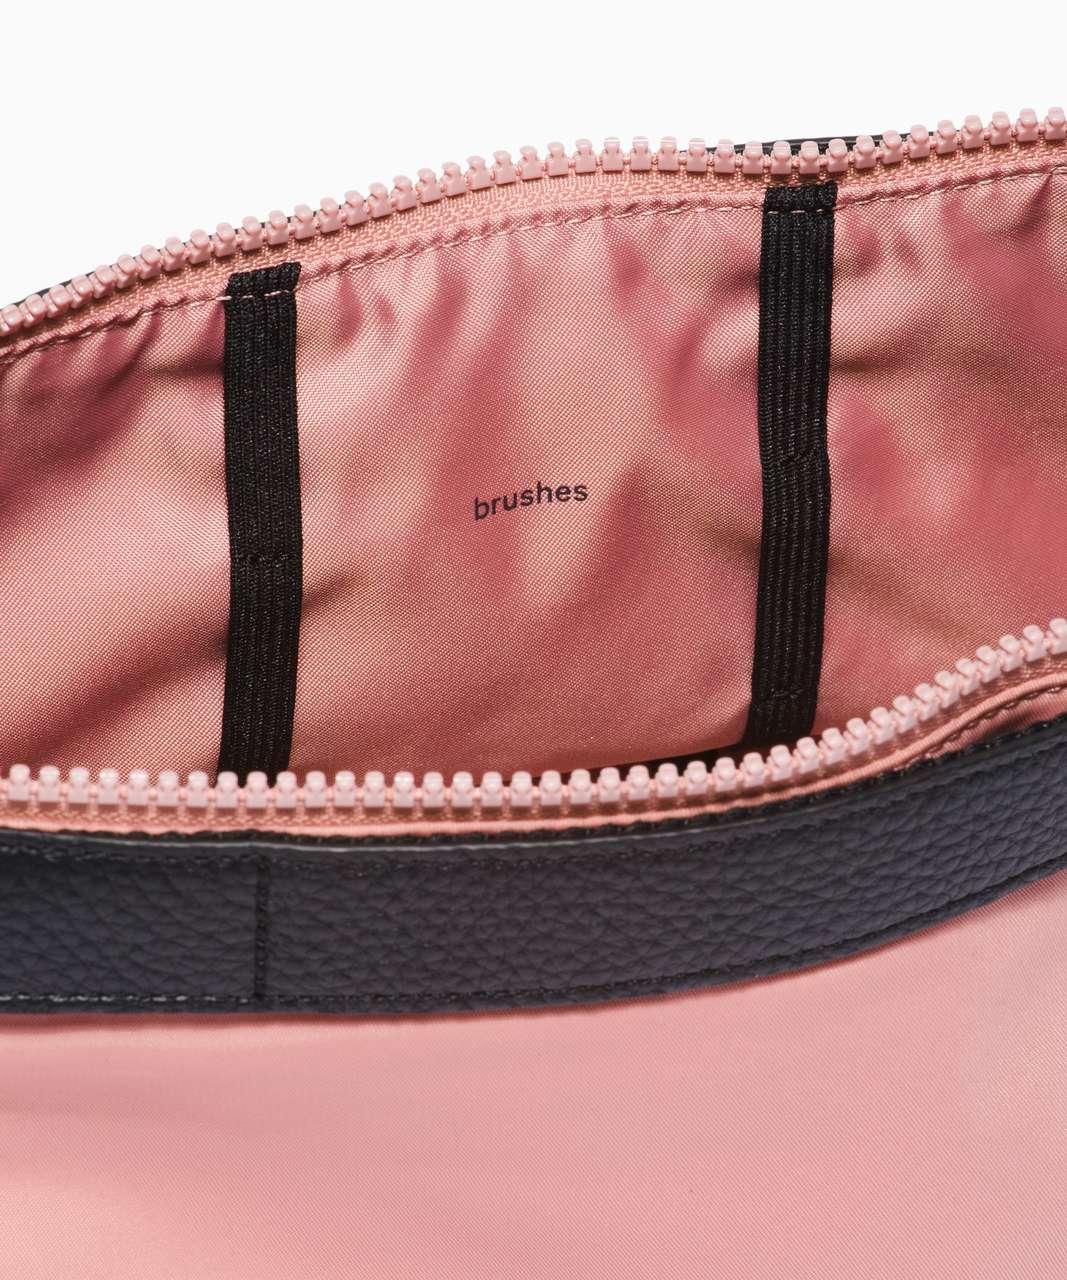 Lululemon Travel Easy Kit *4.5L - Pink Pastel